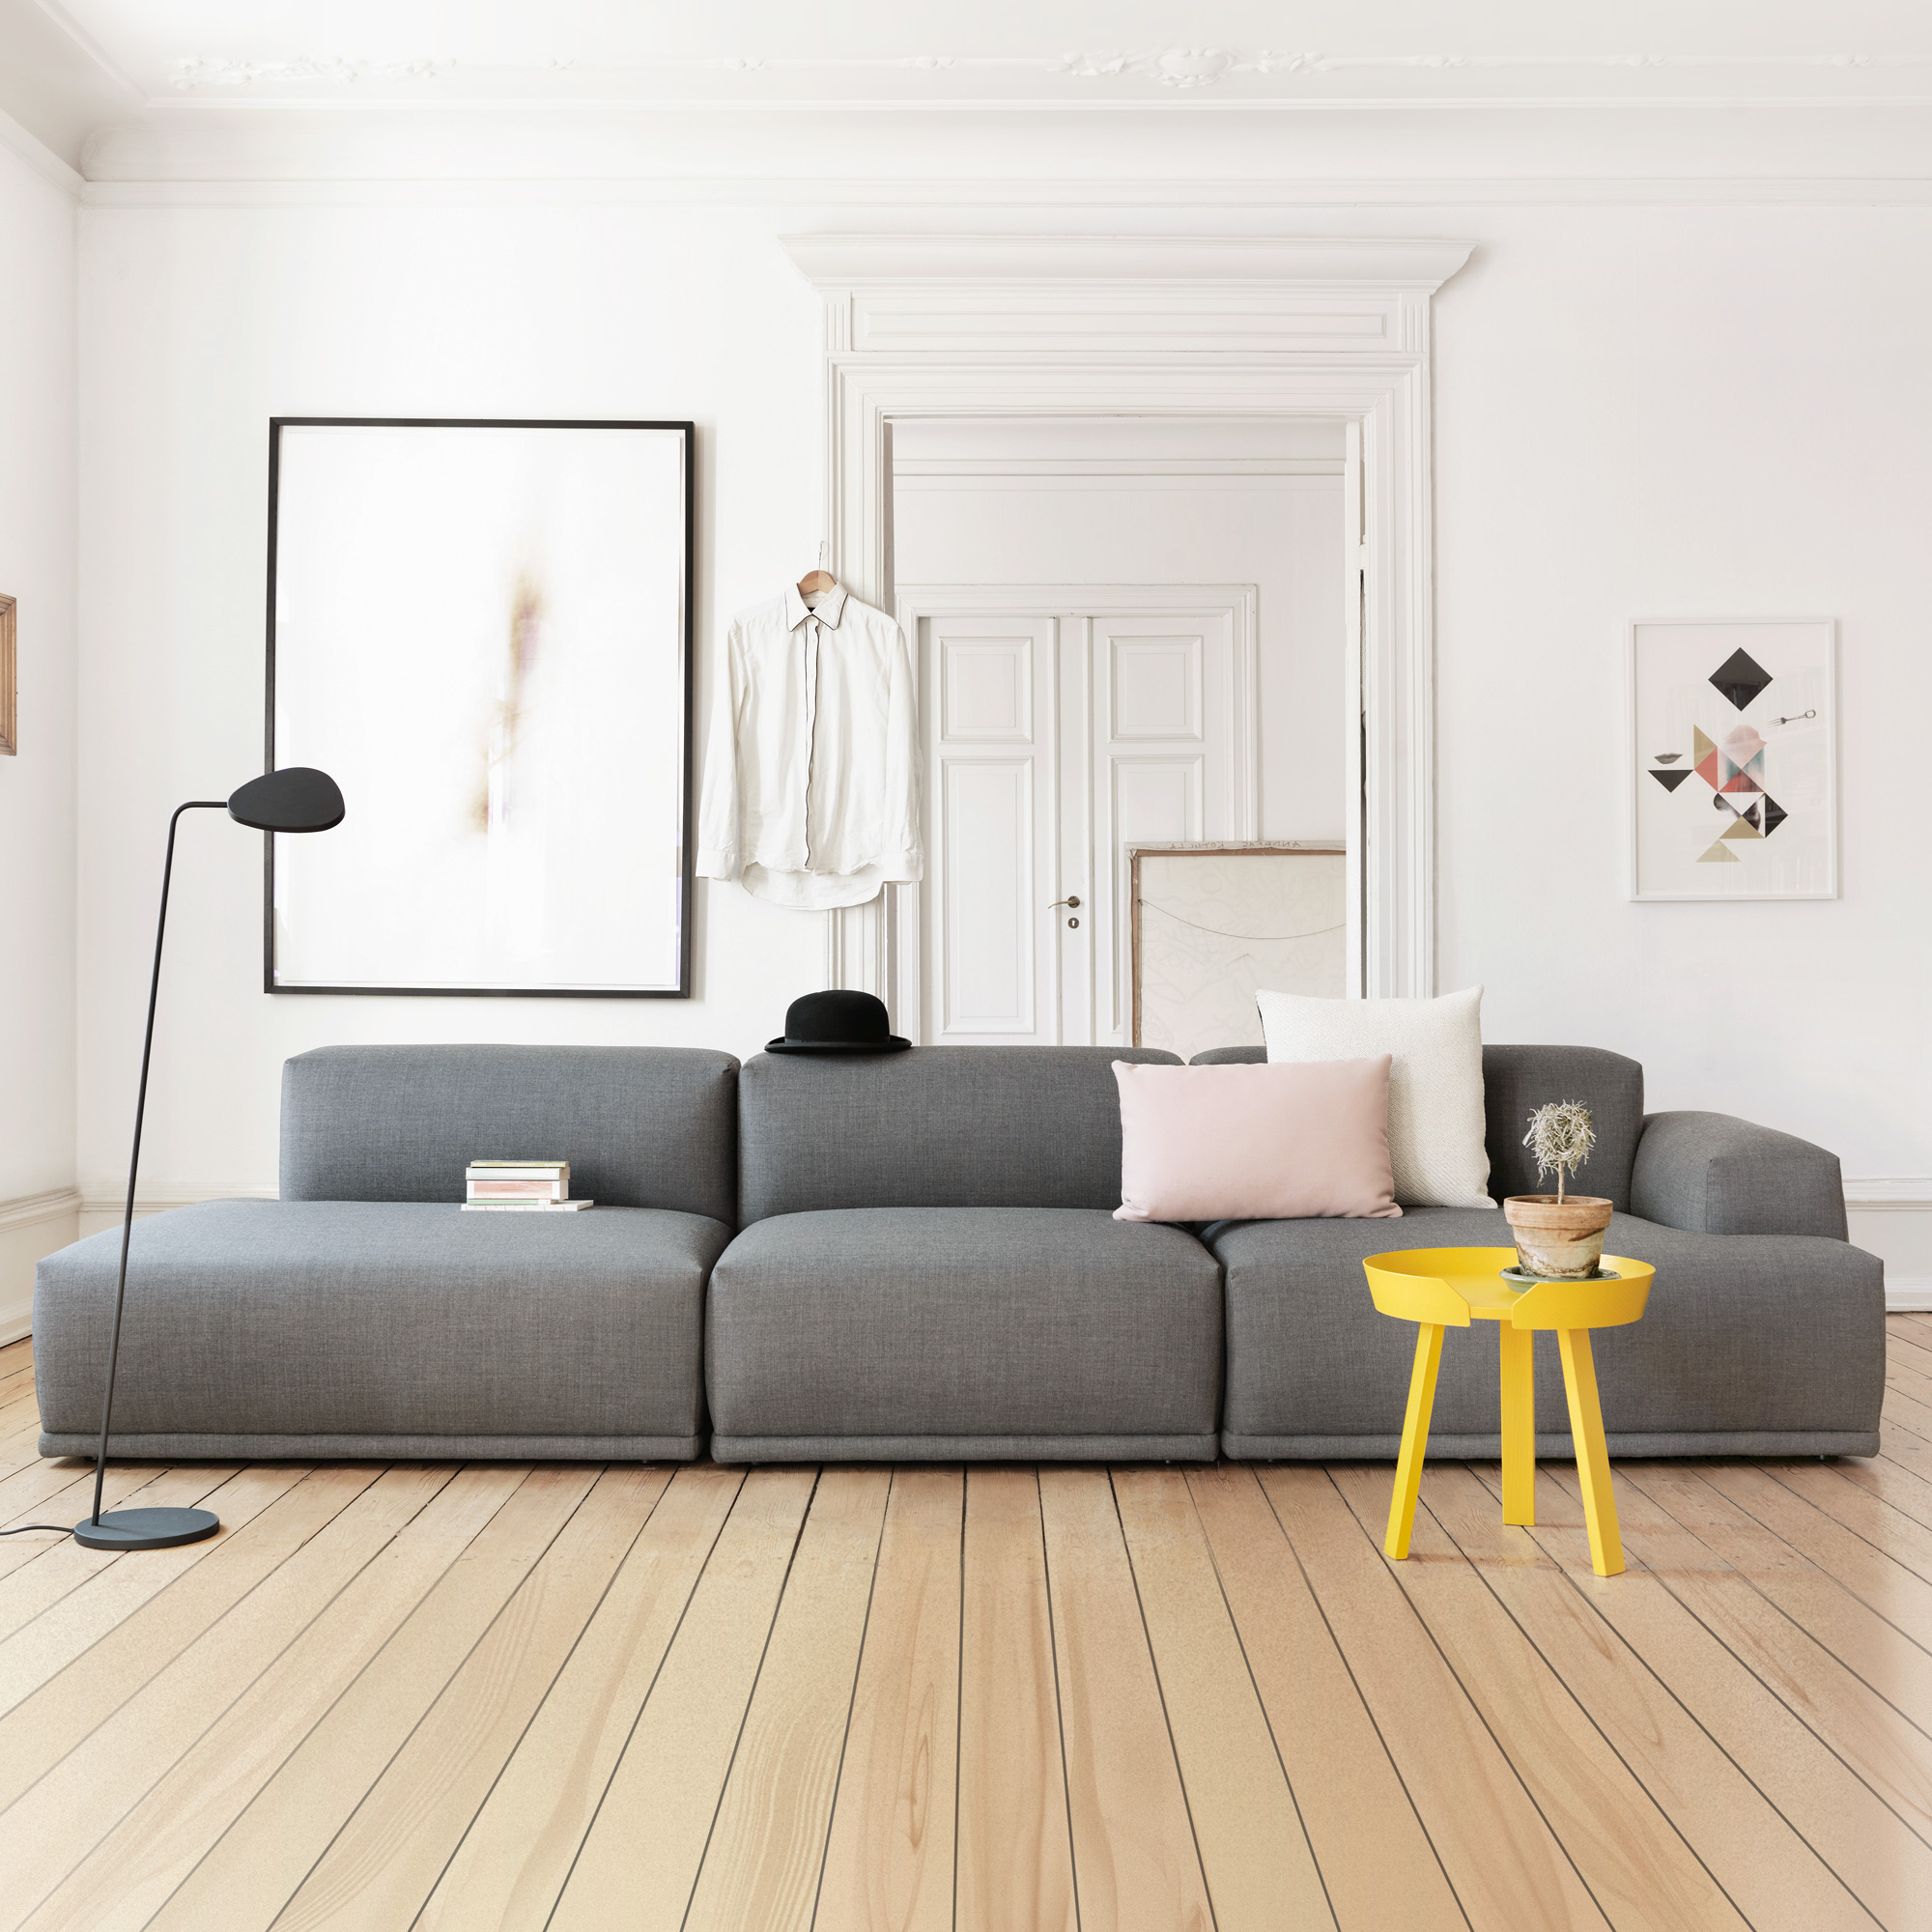 muuto connect sofa 3 sitzer 17462 17464 17466 reuter. Black Bedroom Furniture Sets. Home Design Ideas